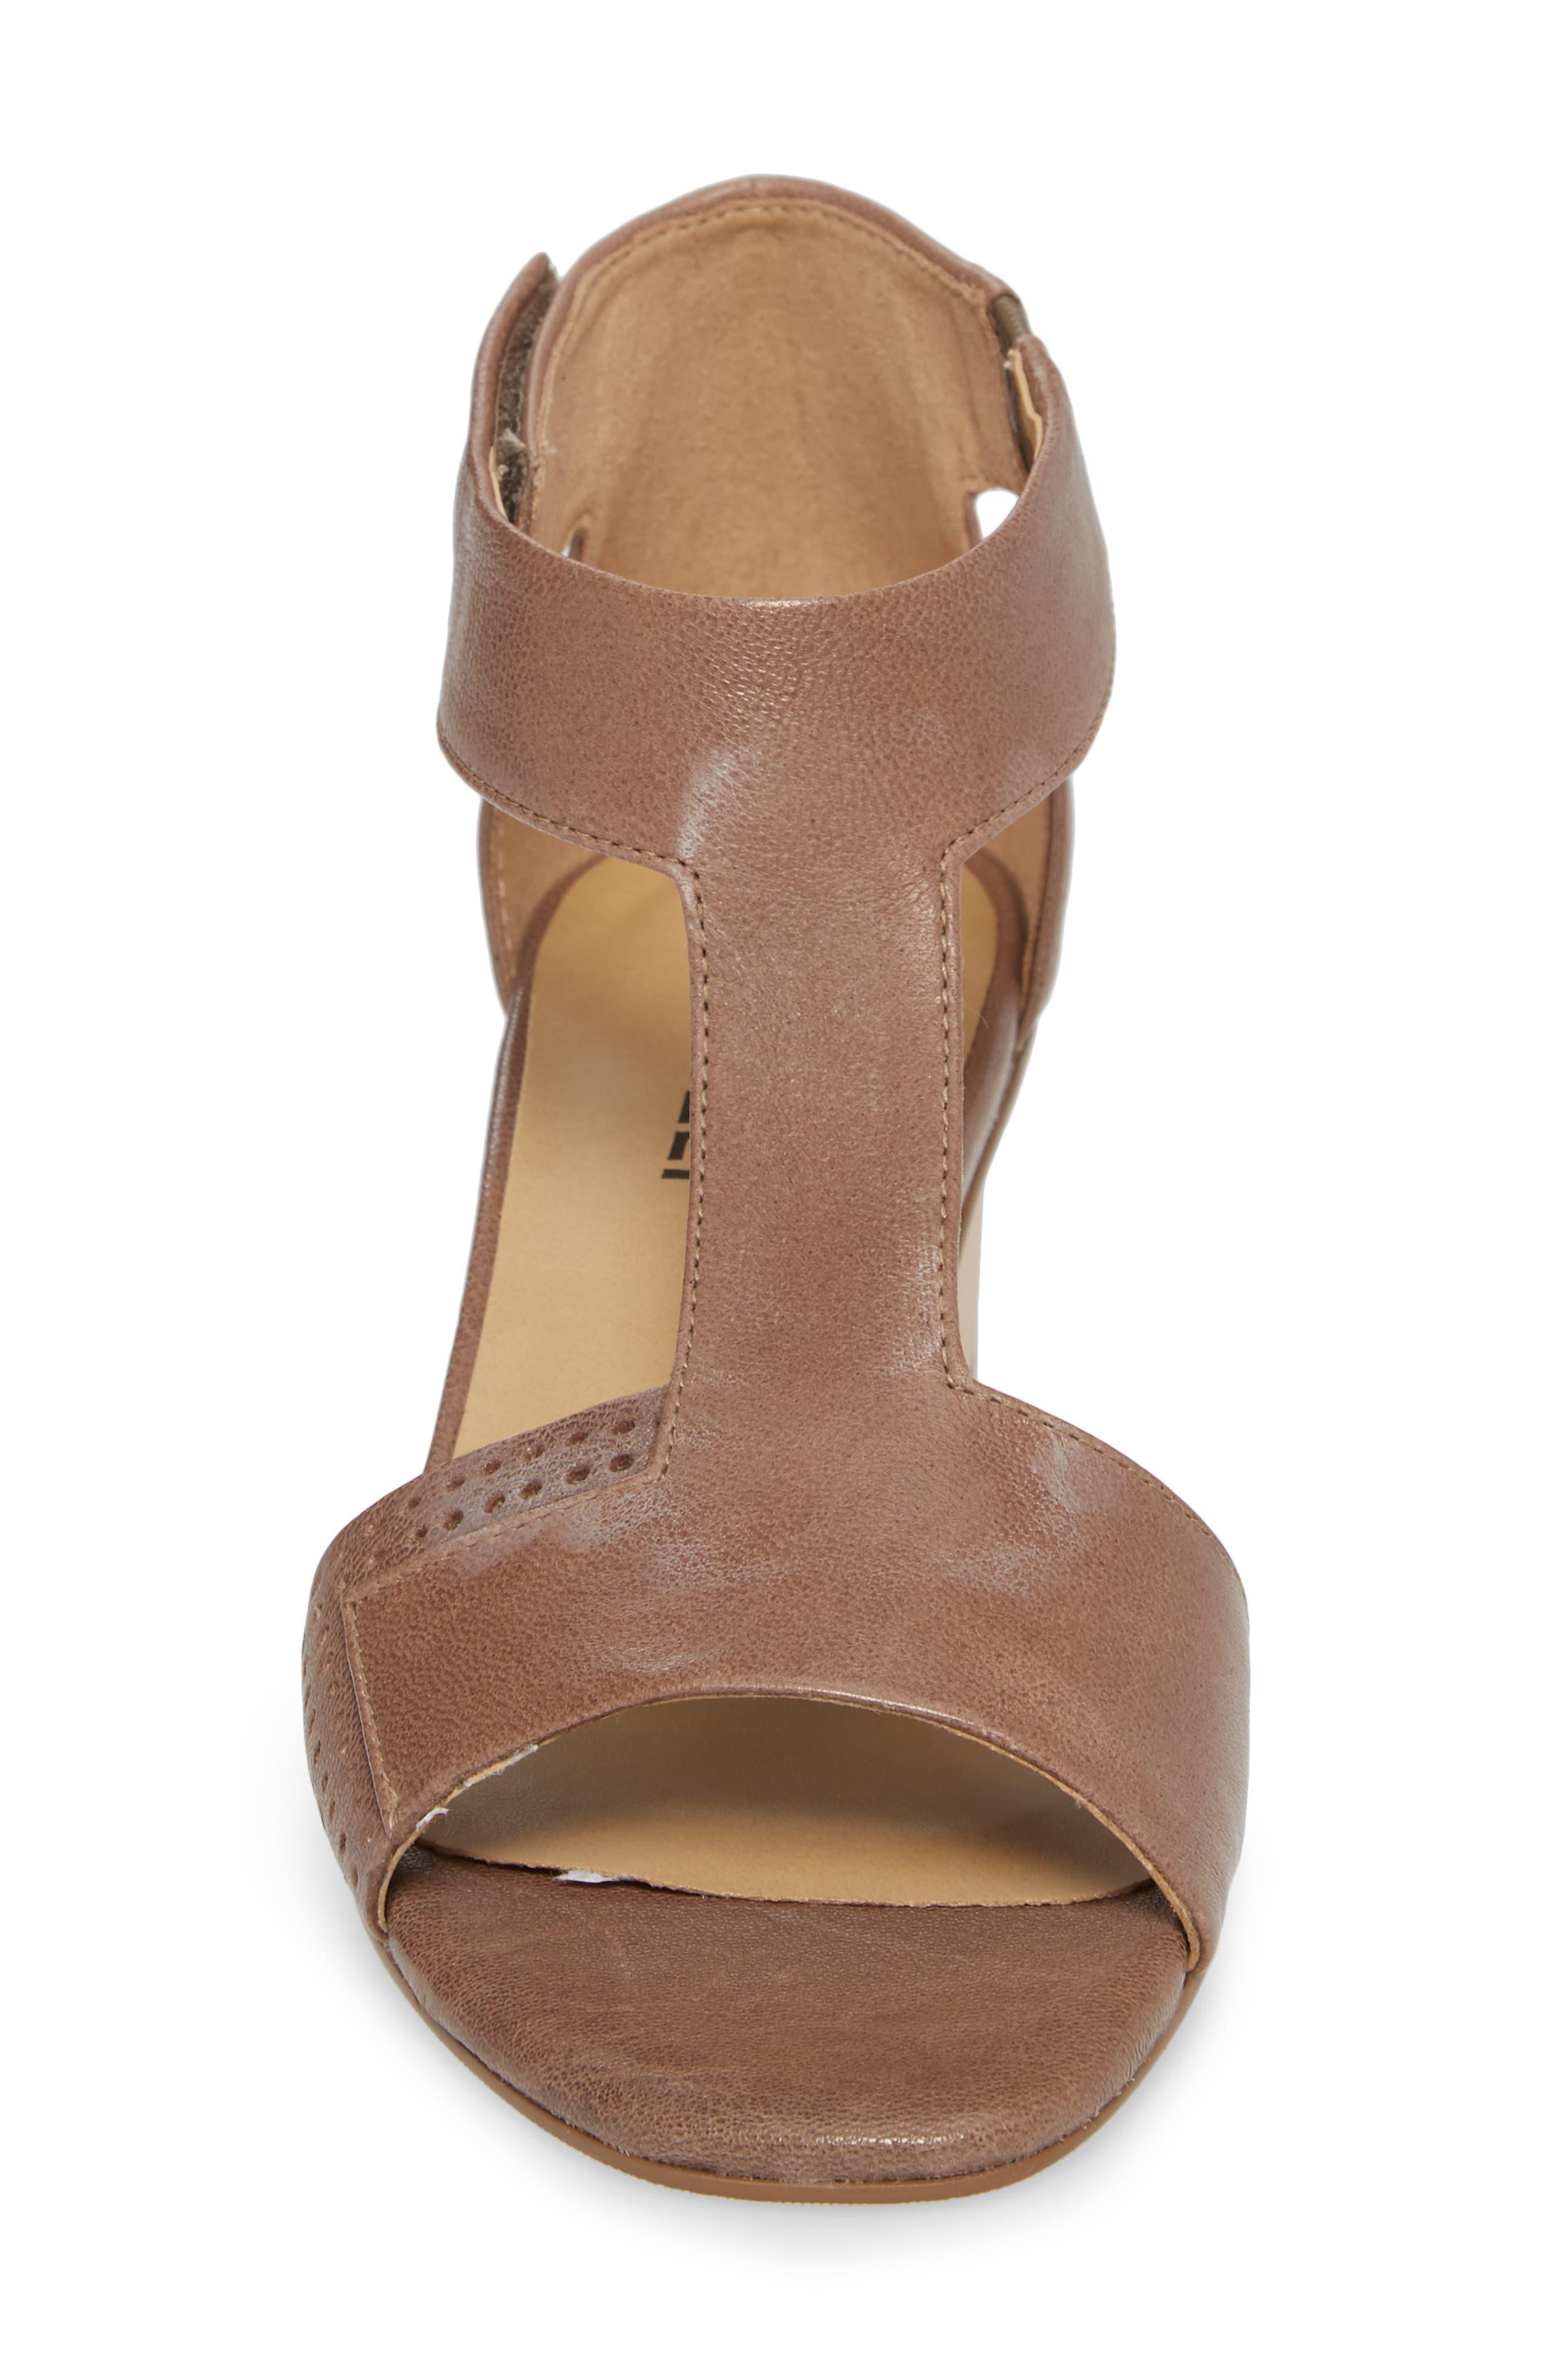 VANELI, Calyx Block Heel Sandal, Alternate thumbnail 4, color, STONE LEATHER